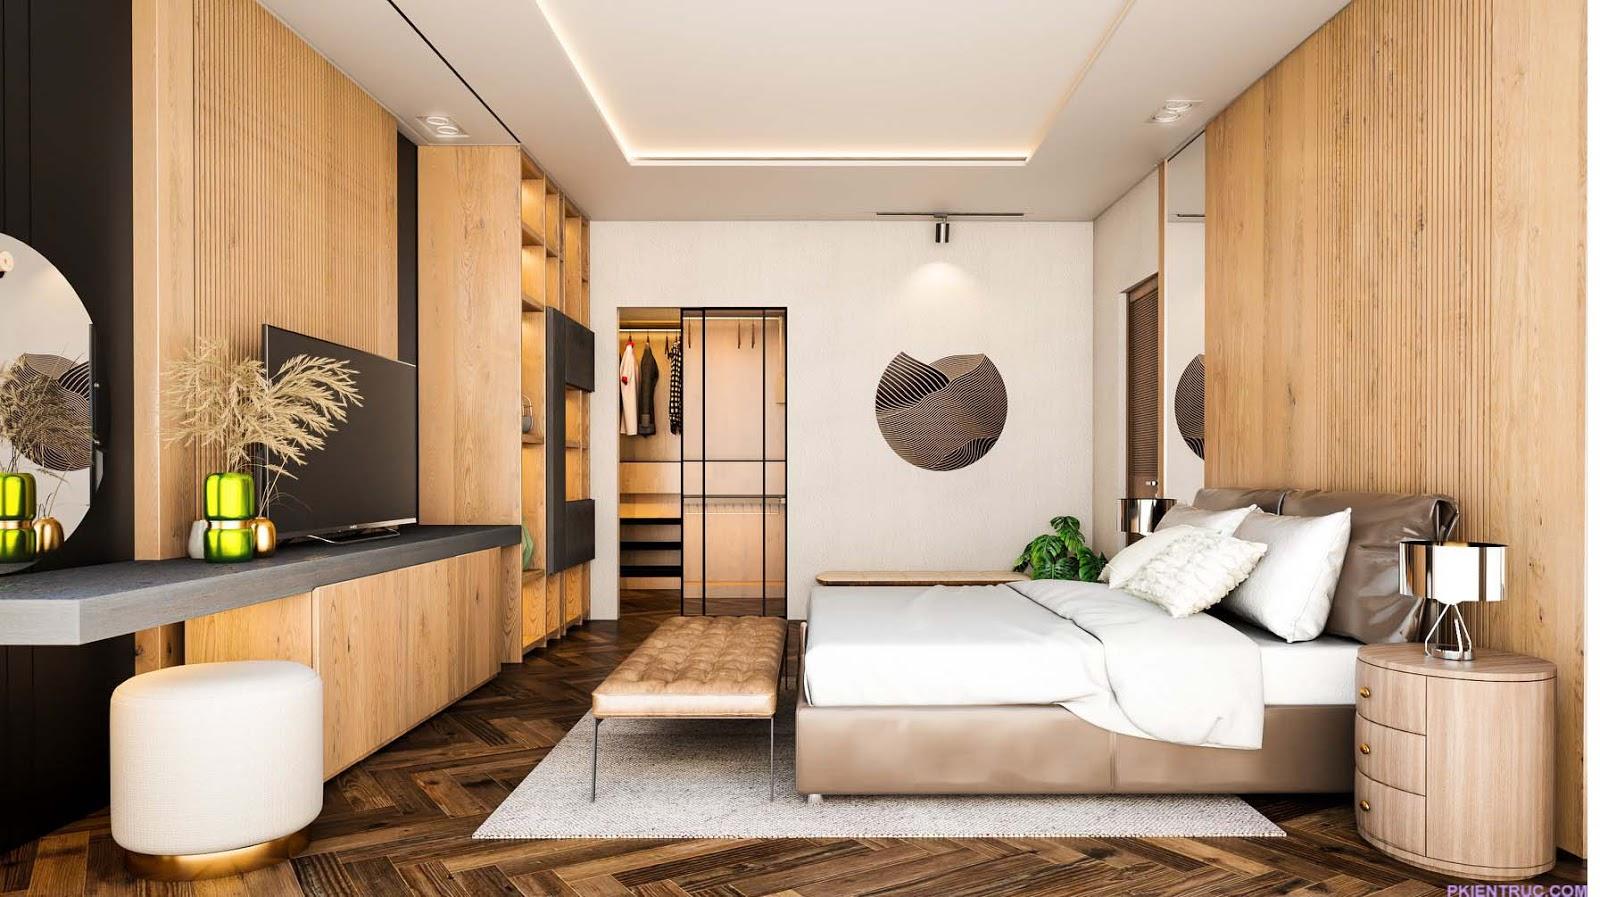 Phối cảnh phòng ngủ cực kỳ sang chảnh -view 2